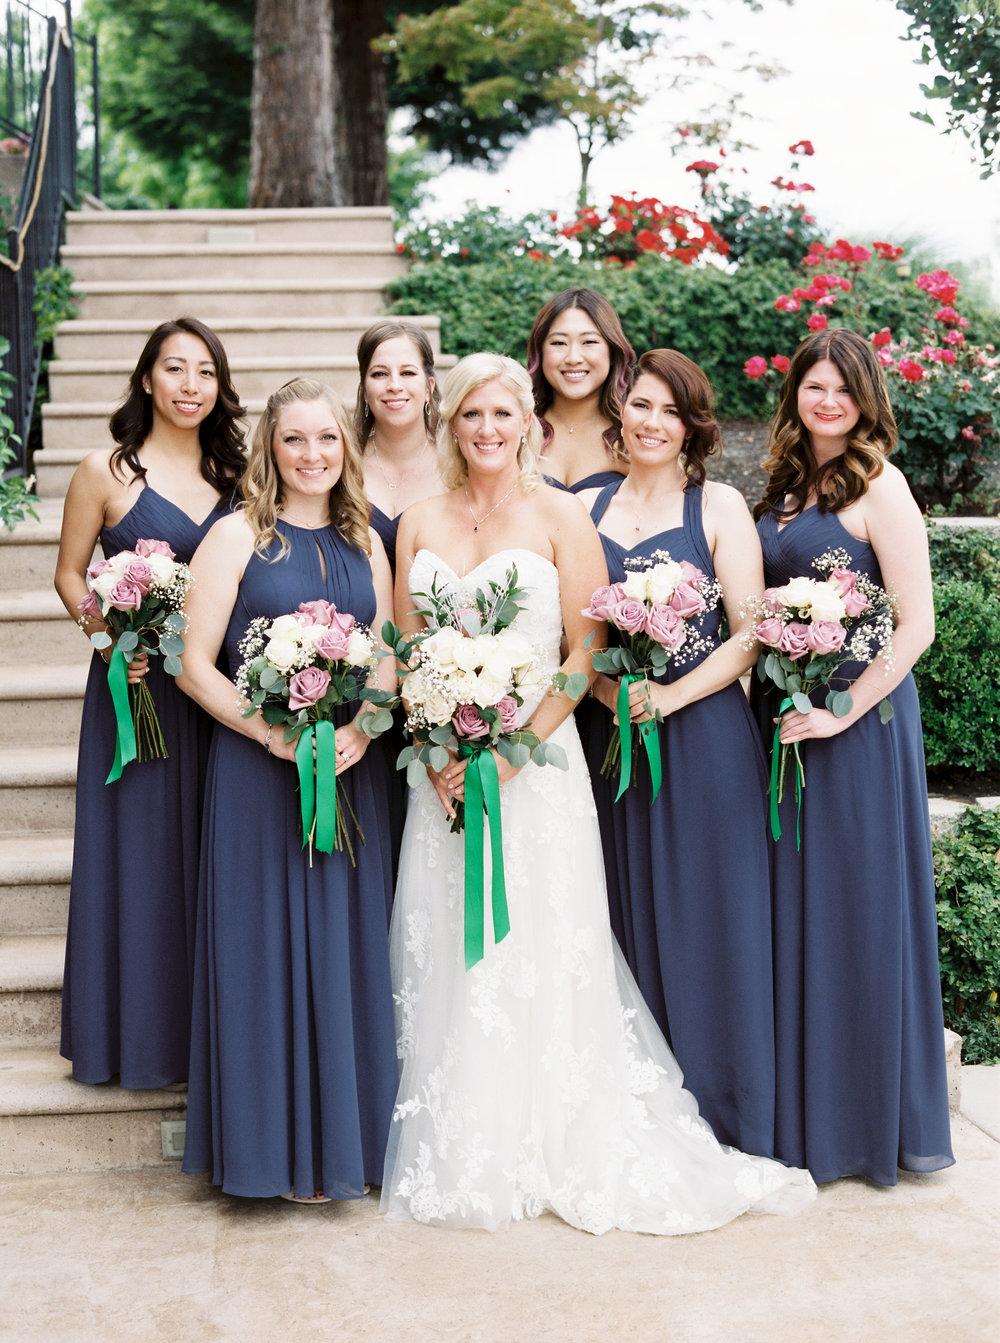 wolfe-heights-event-center-wedding-sacramento-california-wedding-47.jpg